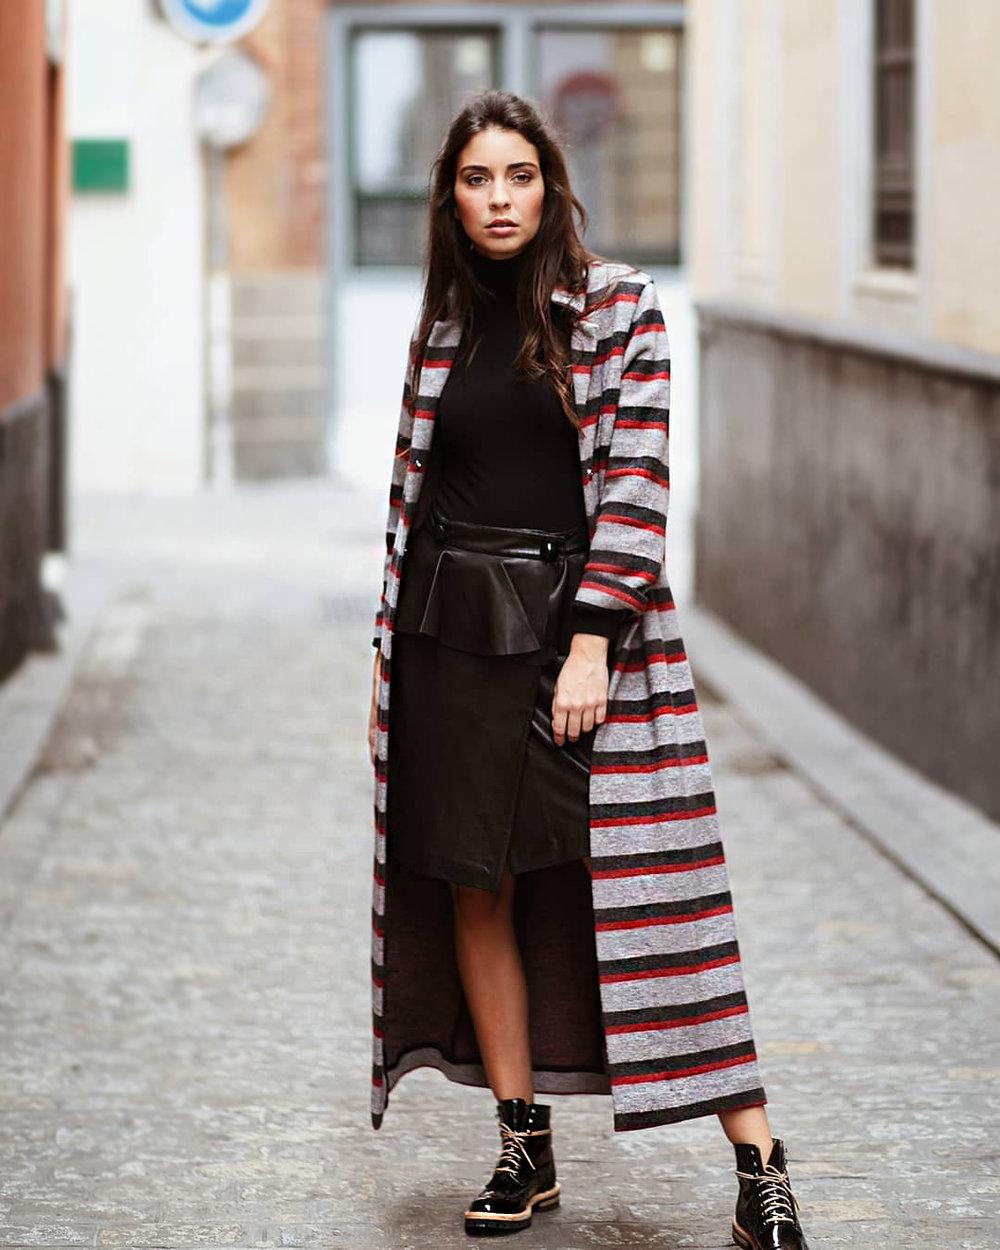 babettephotography_seville fashion sevilla moda editorial 2.jpg